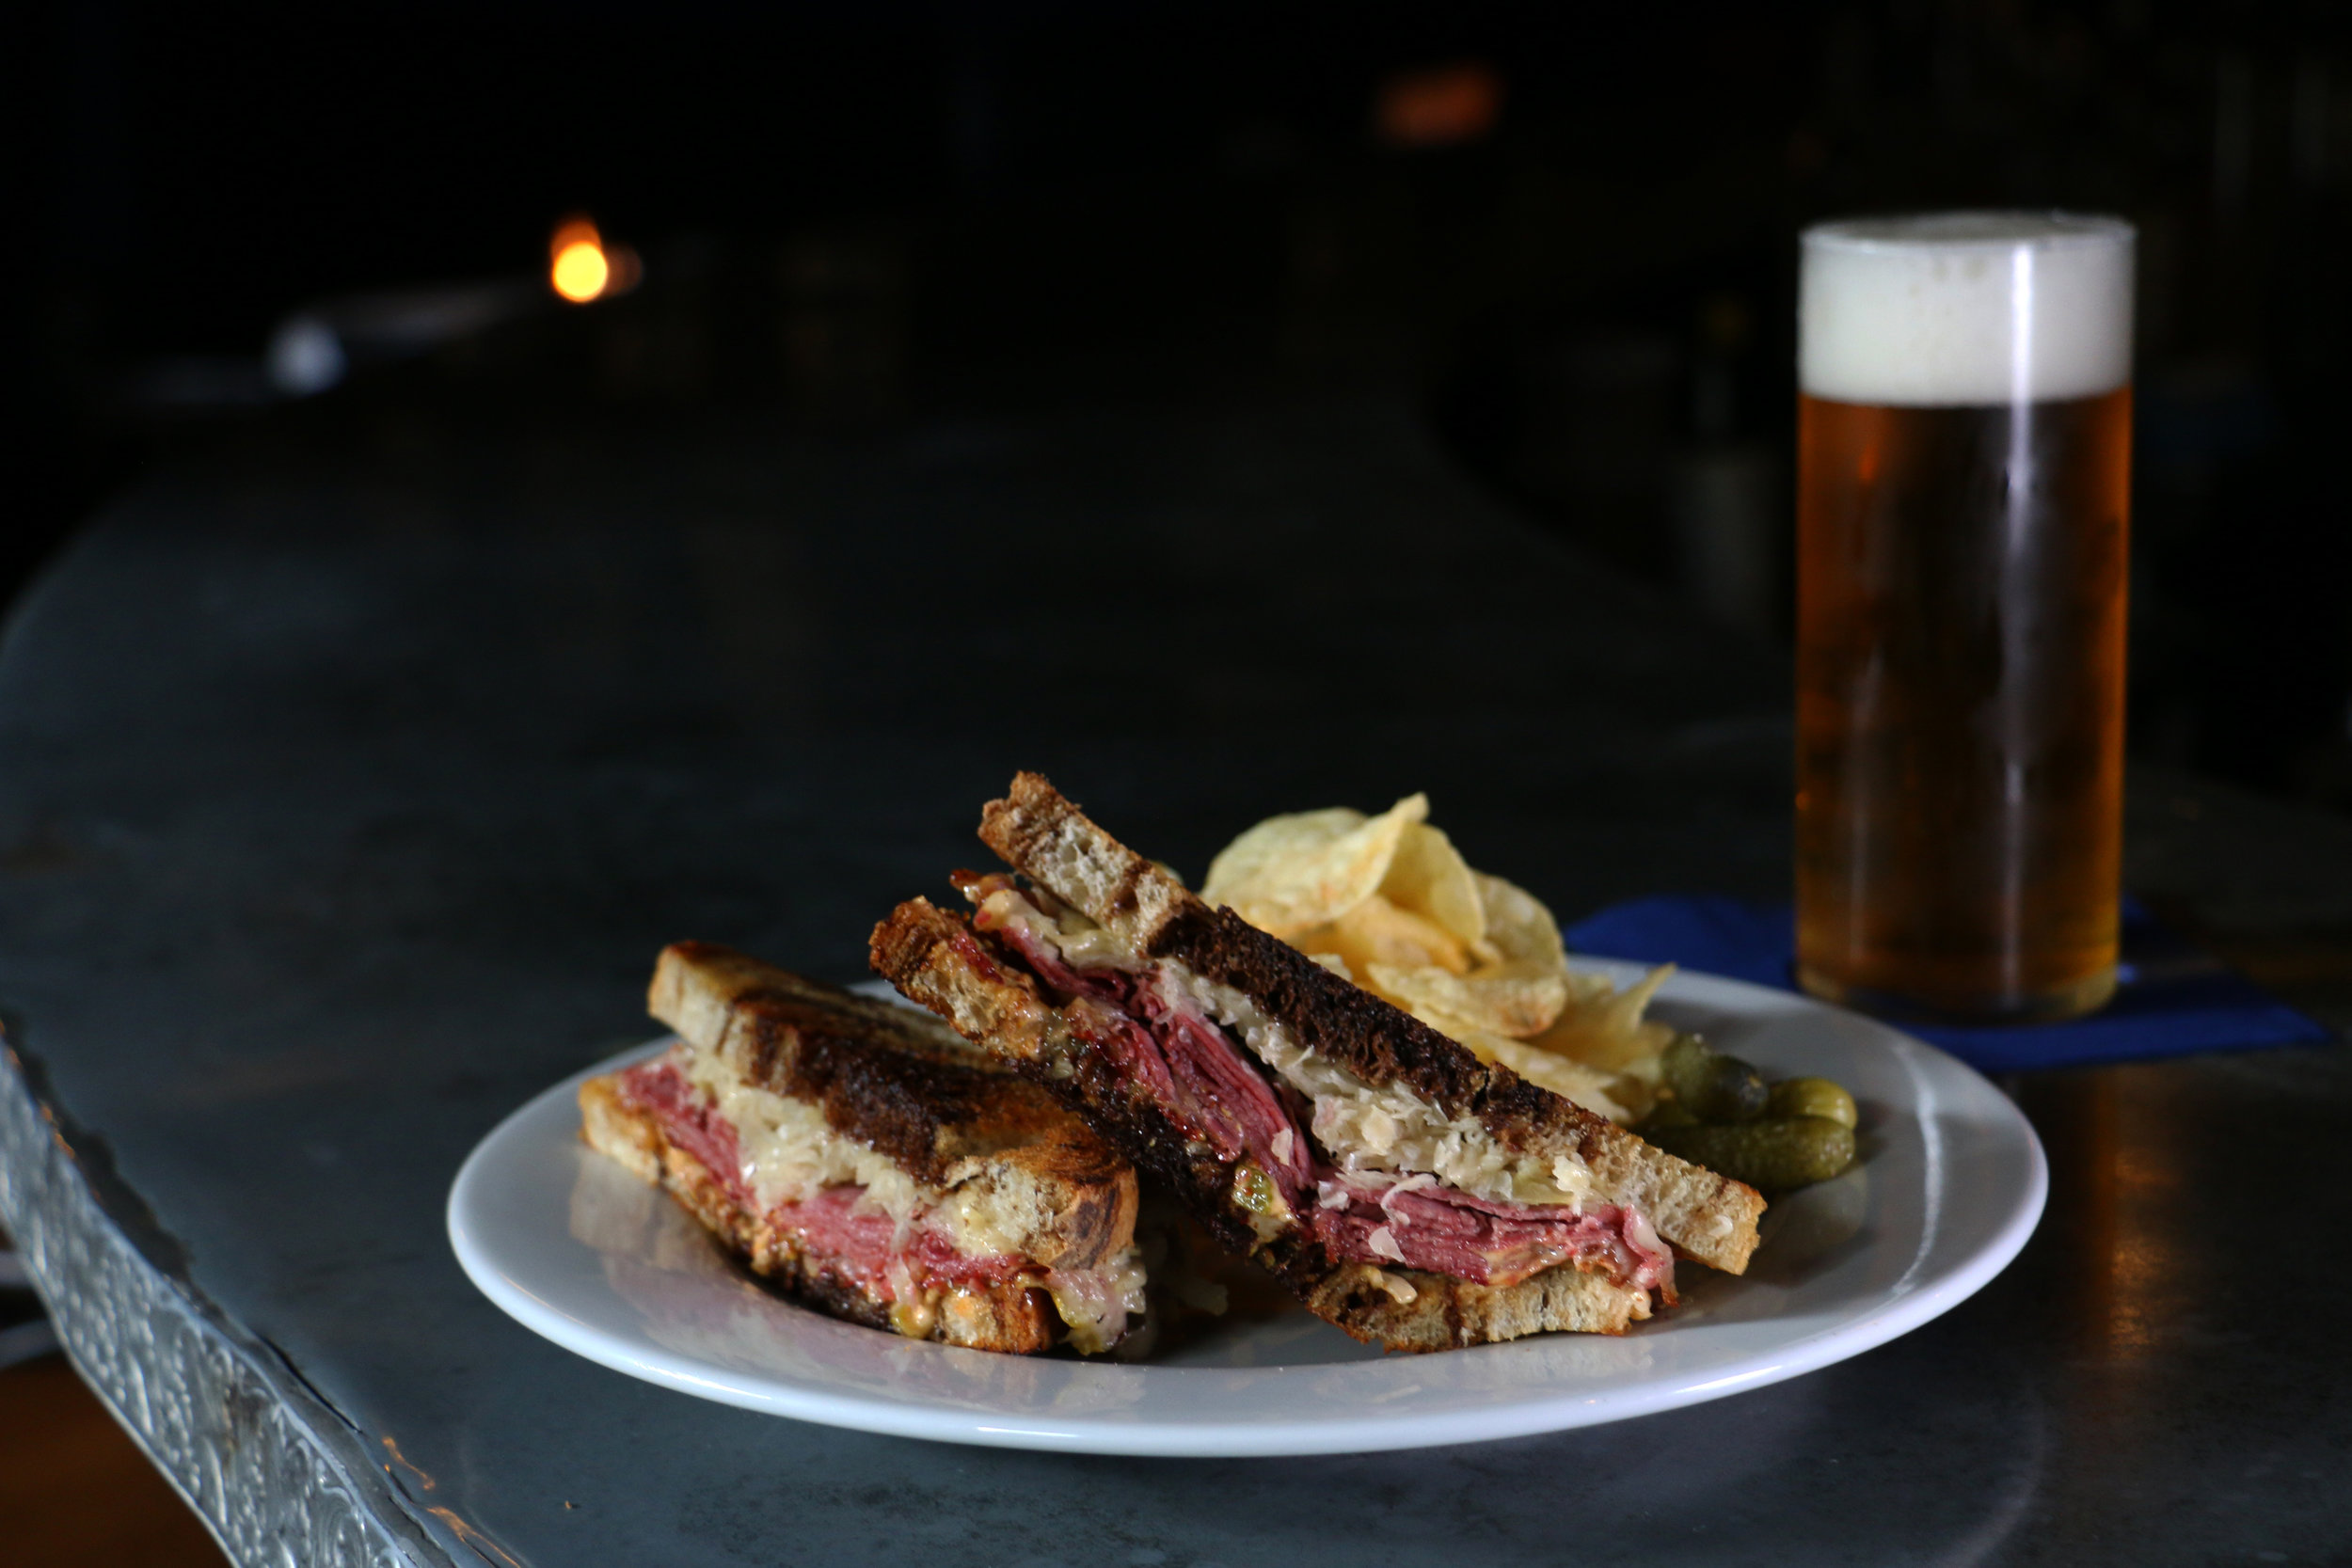 House Corned Beef Sandwich & Guinness Blonde